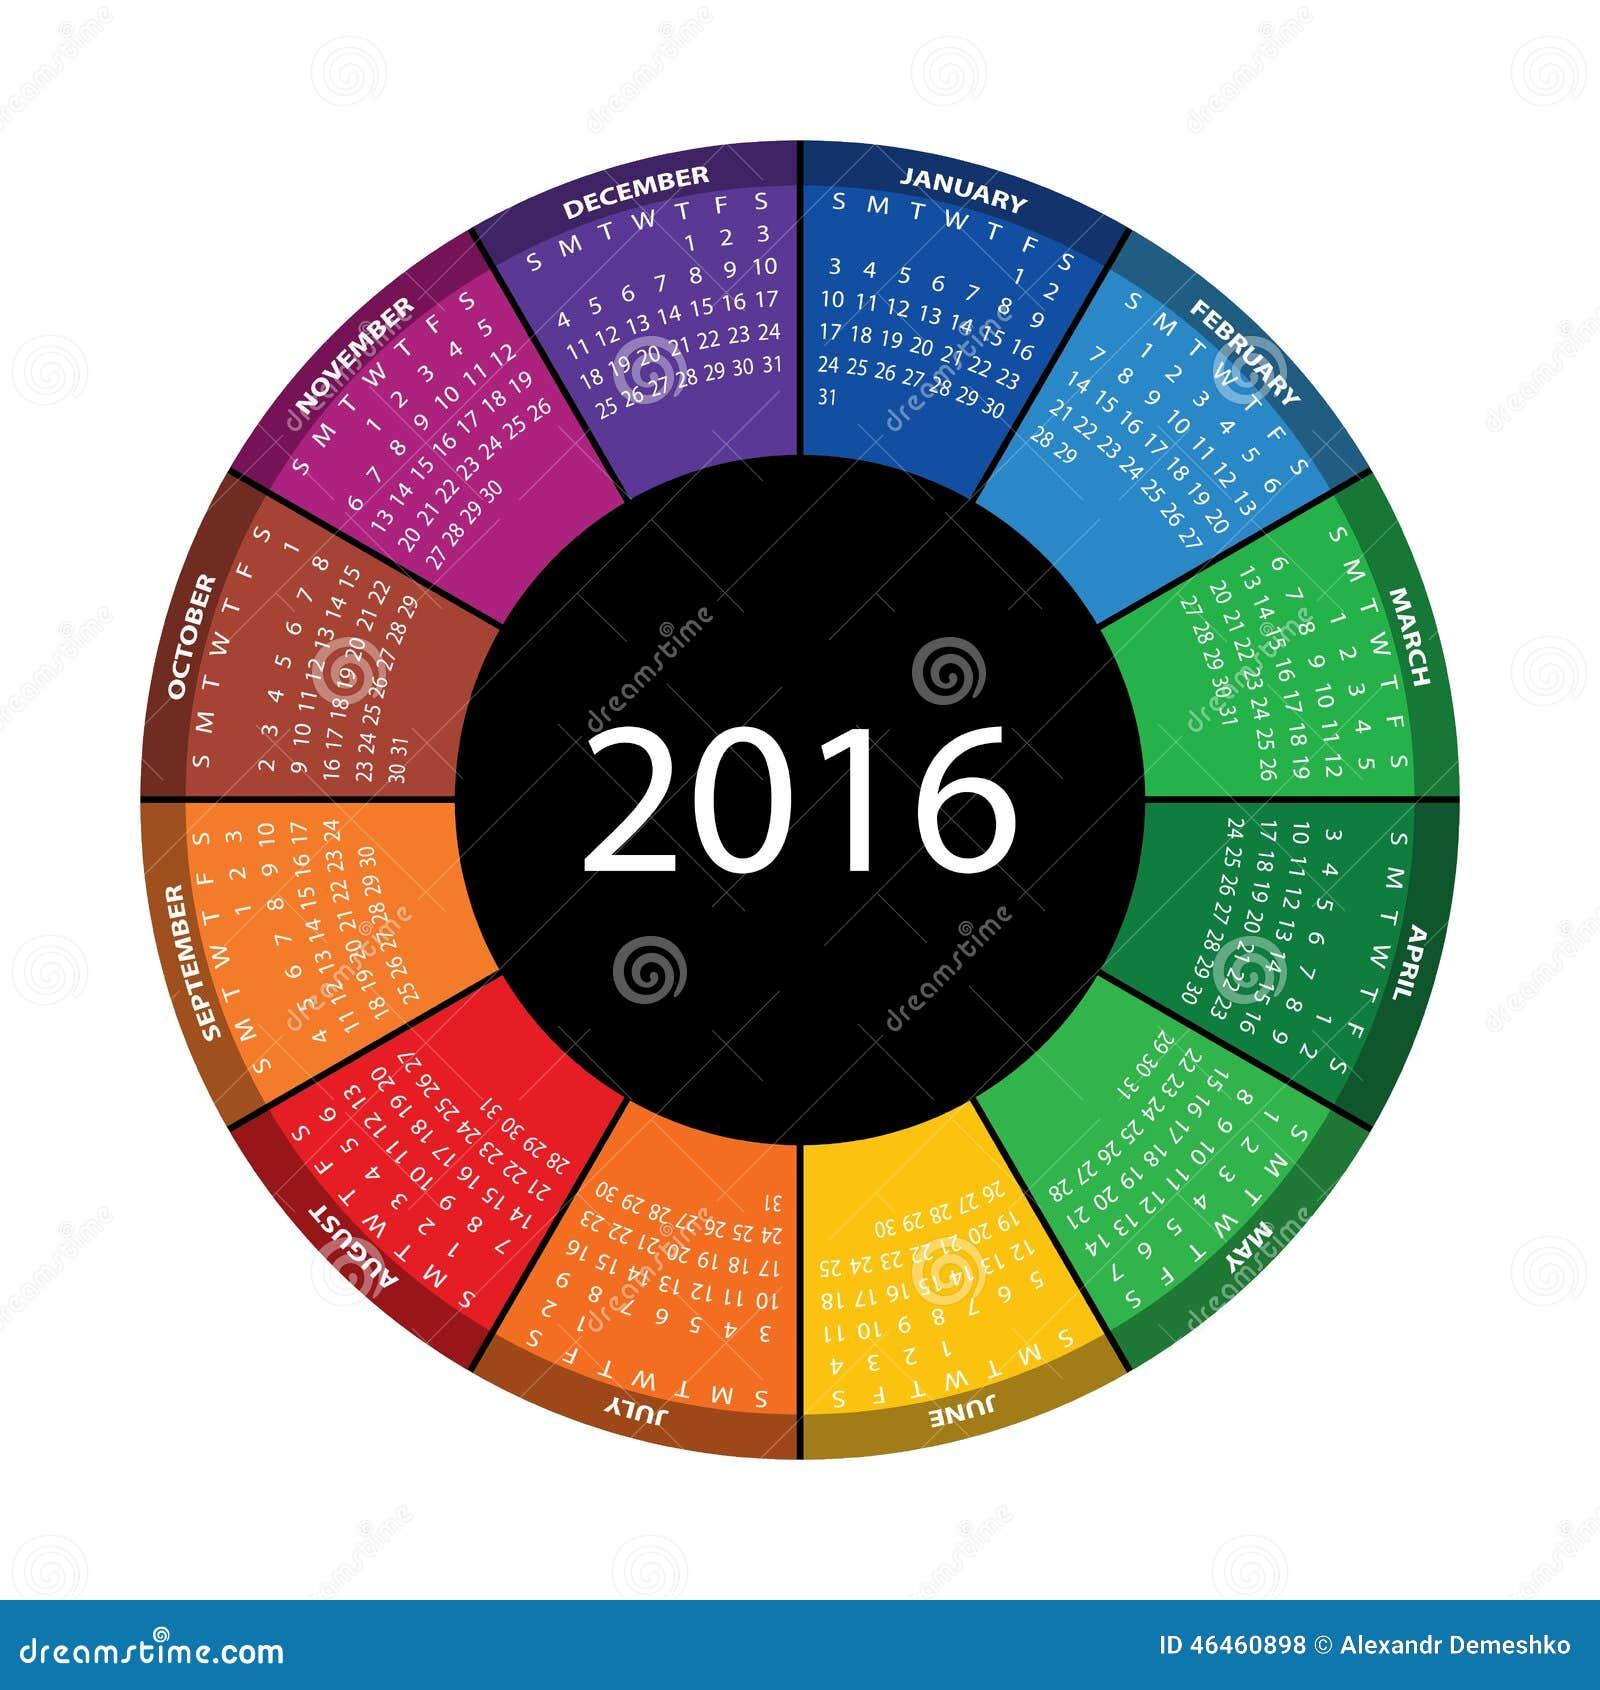 calendrier rond color pendant 2016 ann es illustration de vecteur illustration du. Black Bedroom Furniture Sets. Home Design Ideas